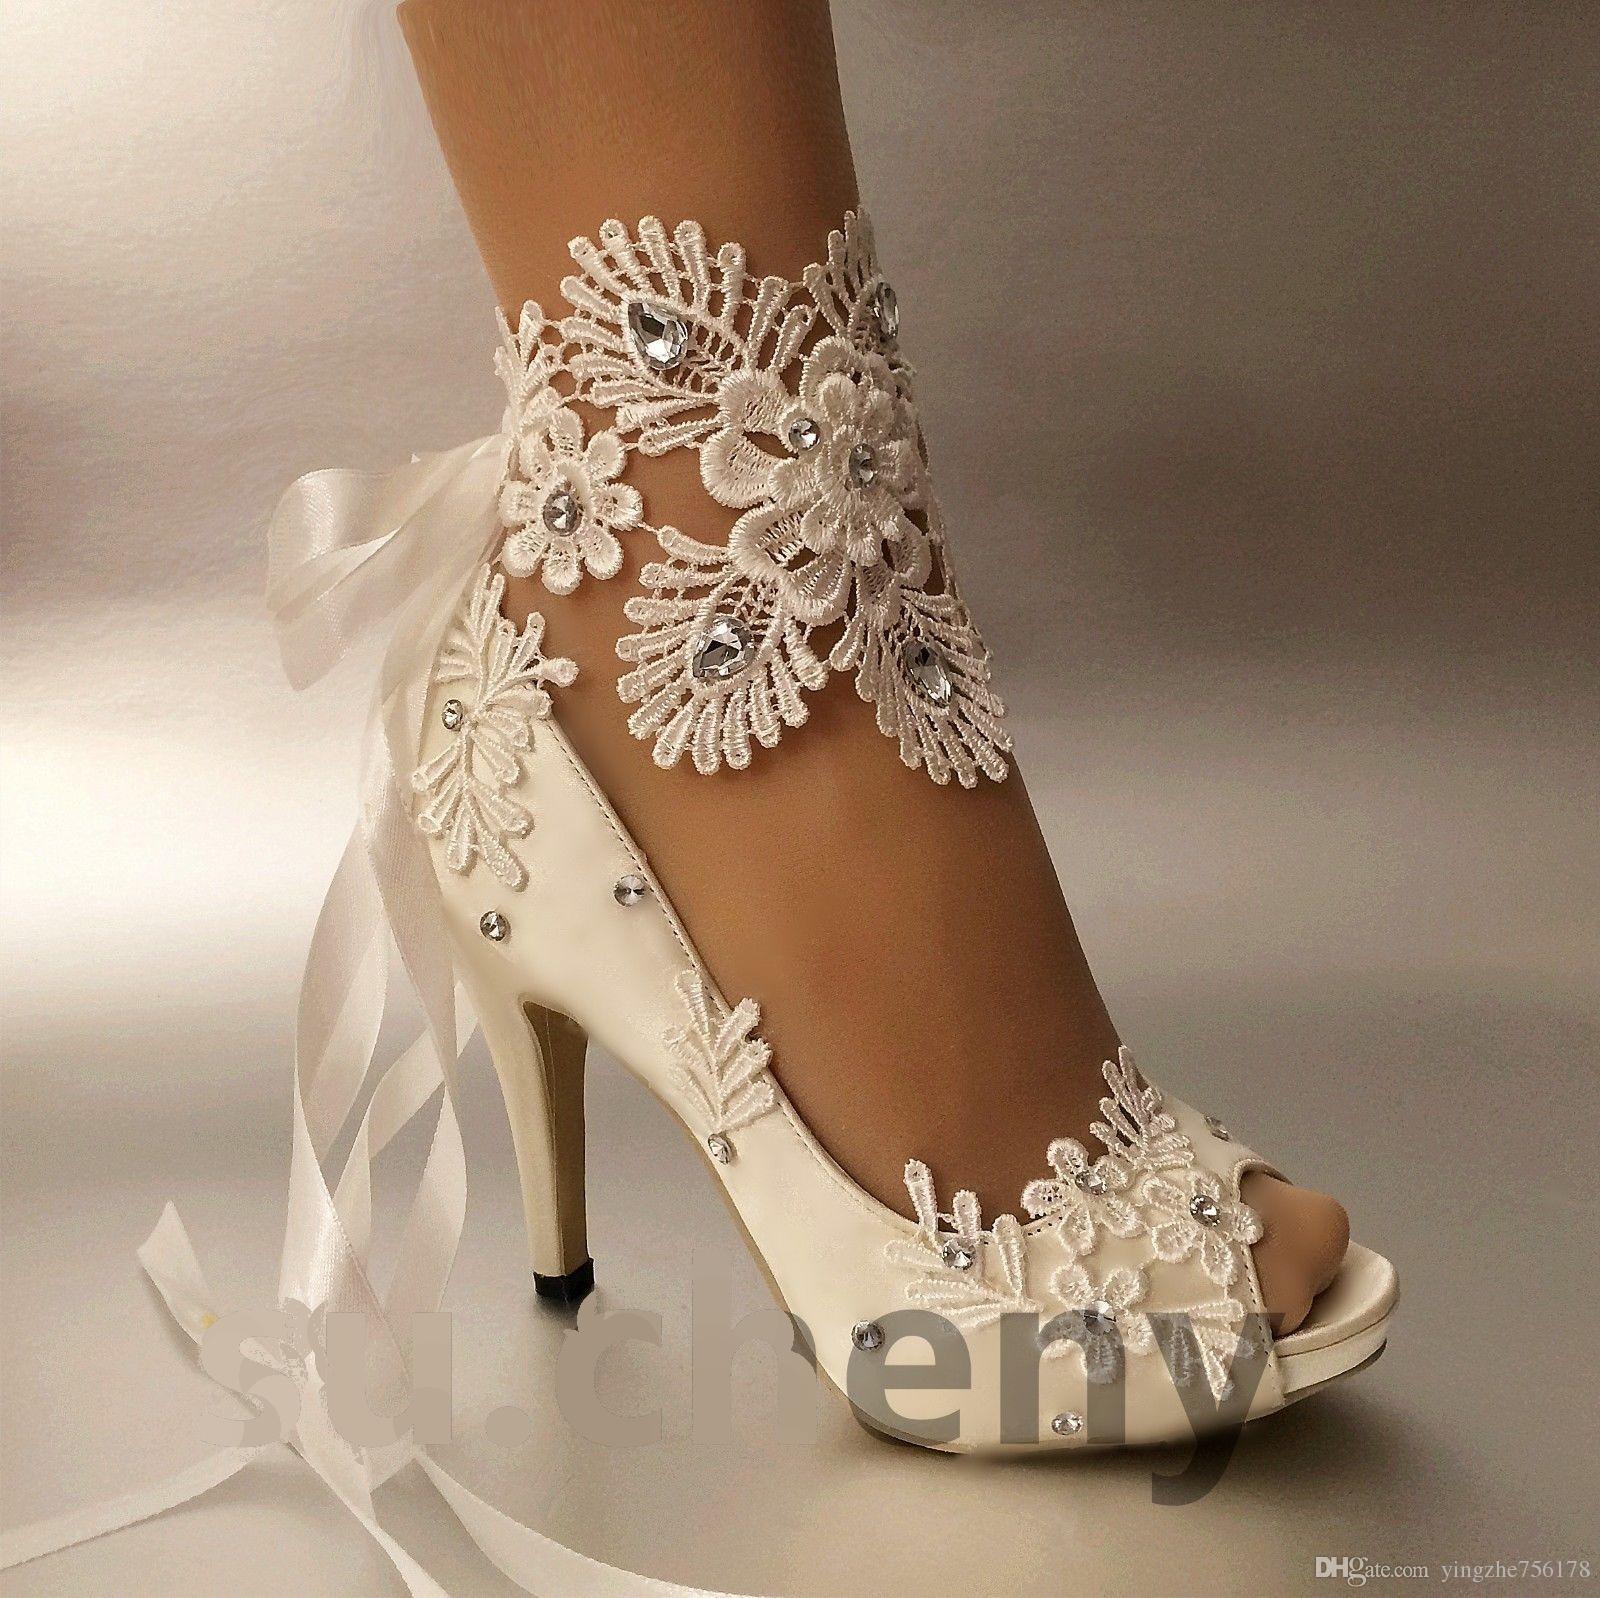 69052e8b923 Handmade Women Fashion Ivory Ribbon Wedding Shoes Heel Ballet Lace Flower  Bridal Bridesmaid Shoes Size 35 42 Ivory Kitten Heel Wedding Shoes Ivory  Wedding ...